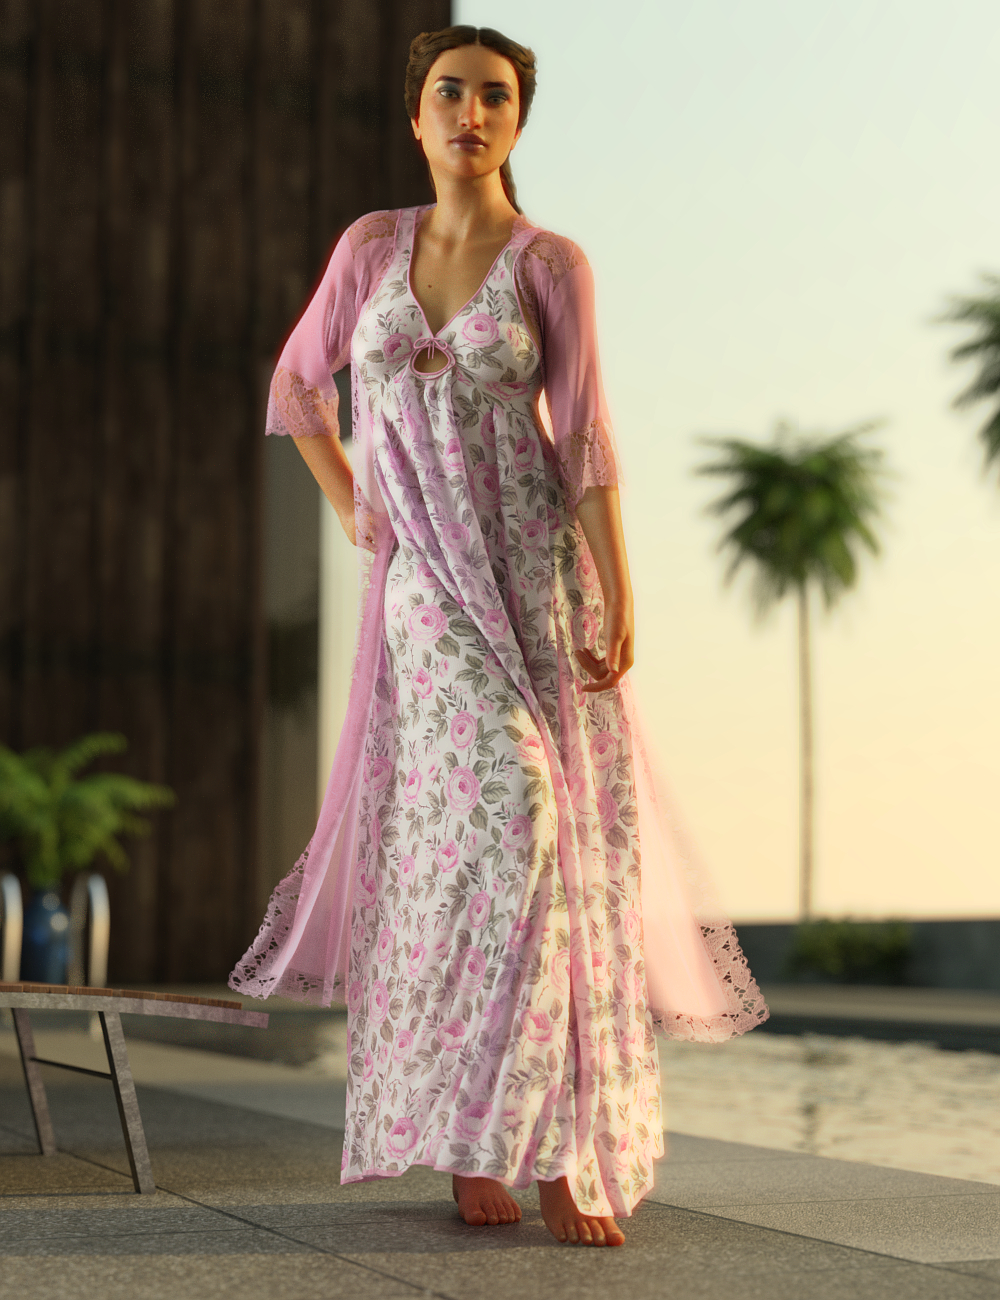 dForce Beach Breeze Outfit for Genesis 8 Female(s) by: Toyen, 3D Models by Daz 3D